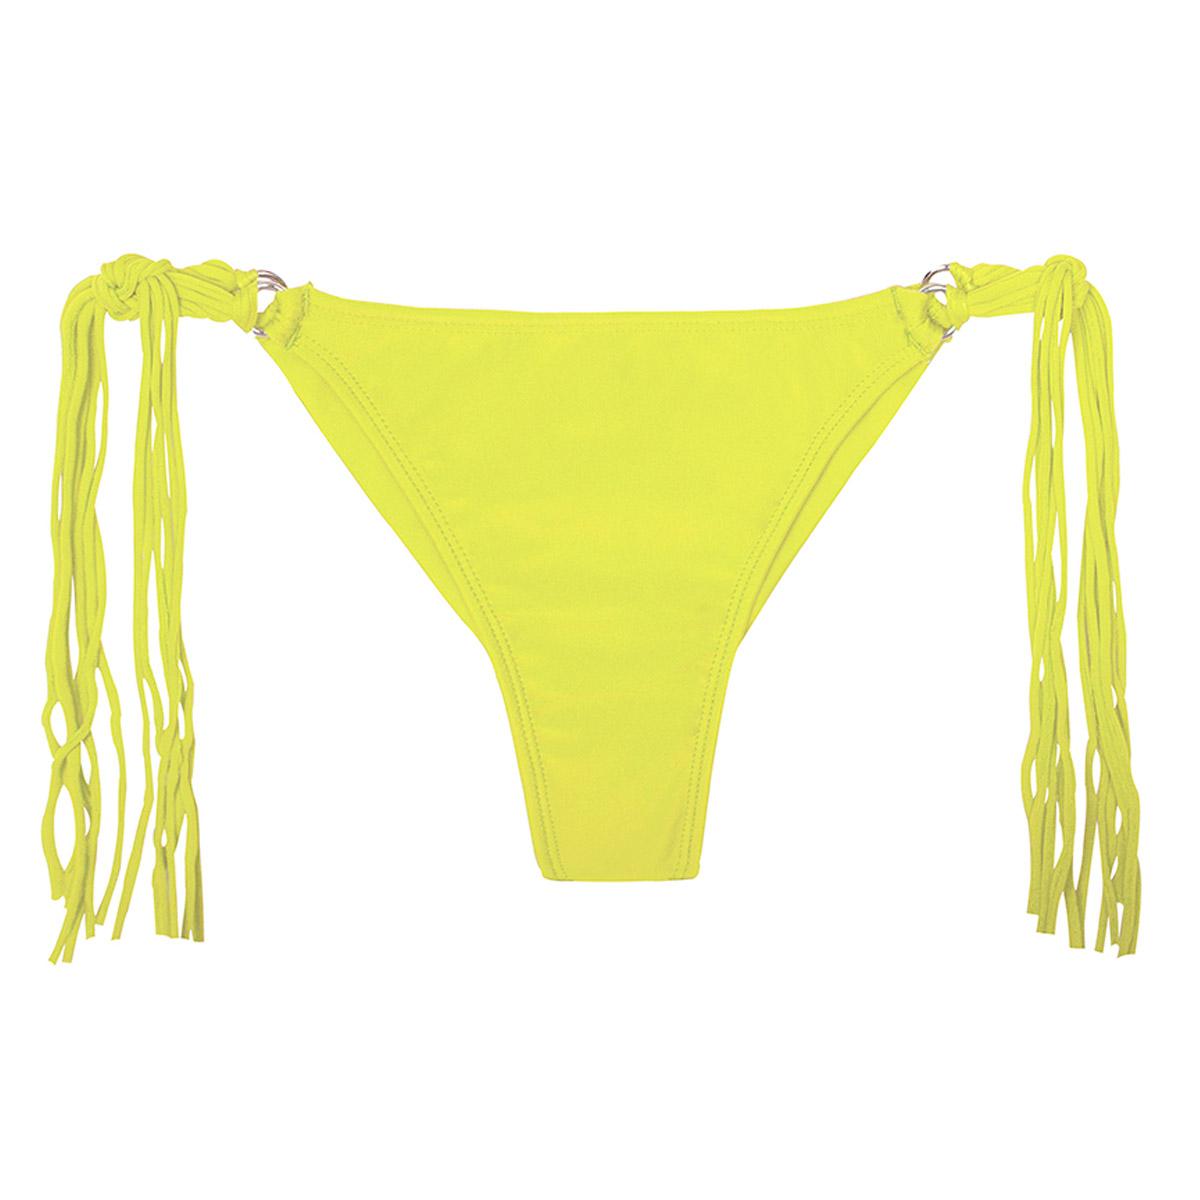 Partes De Abajo De Bikini Brasileño - Calcinha Franja Acid Fio